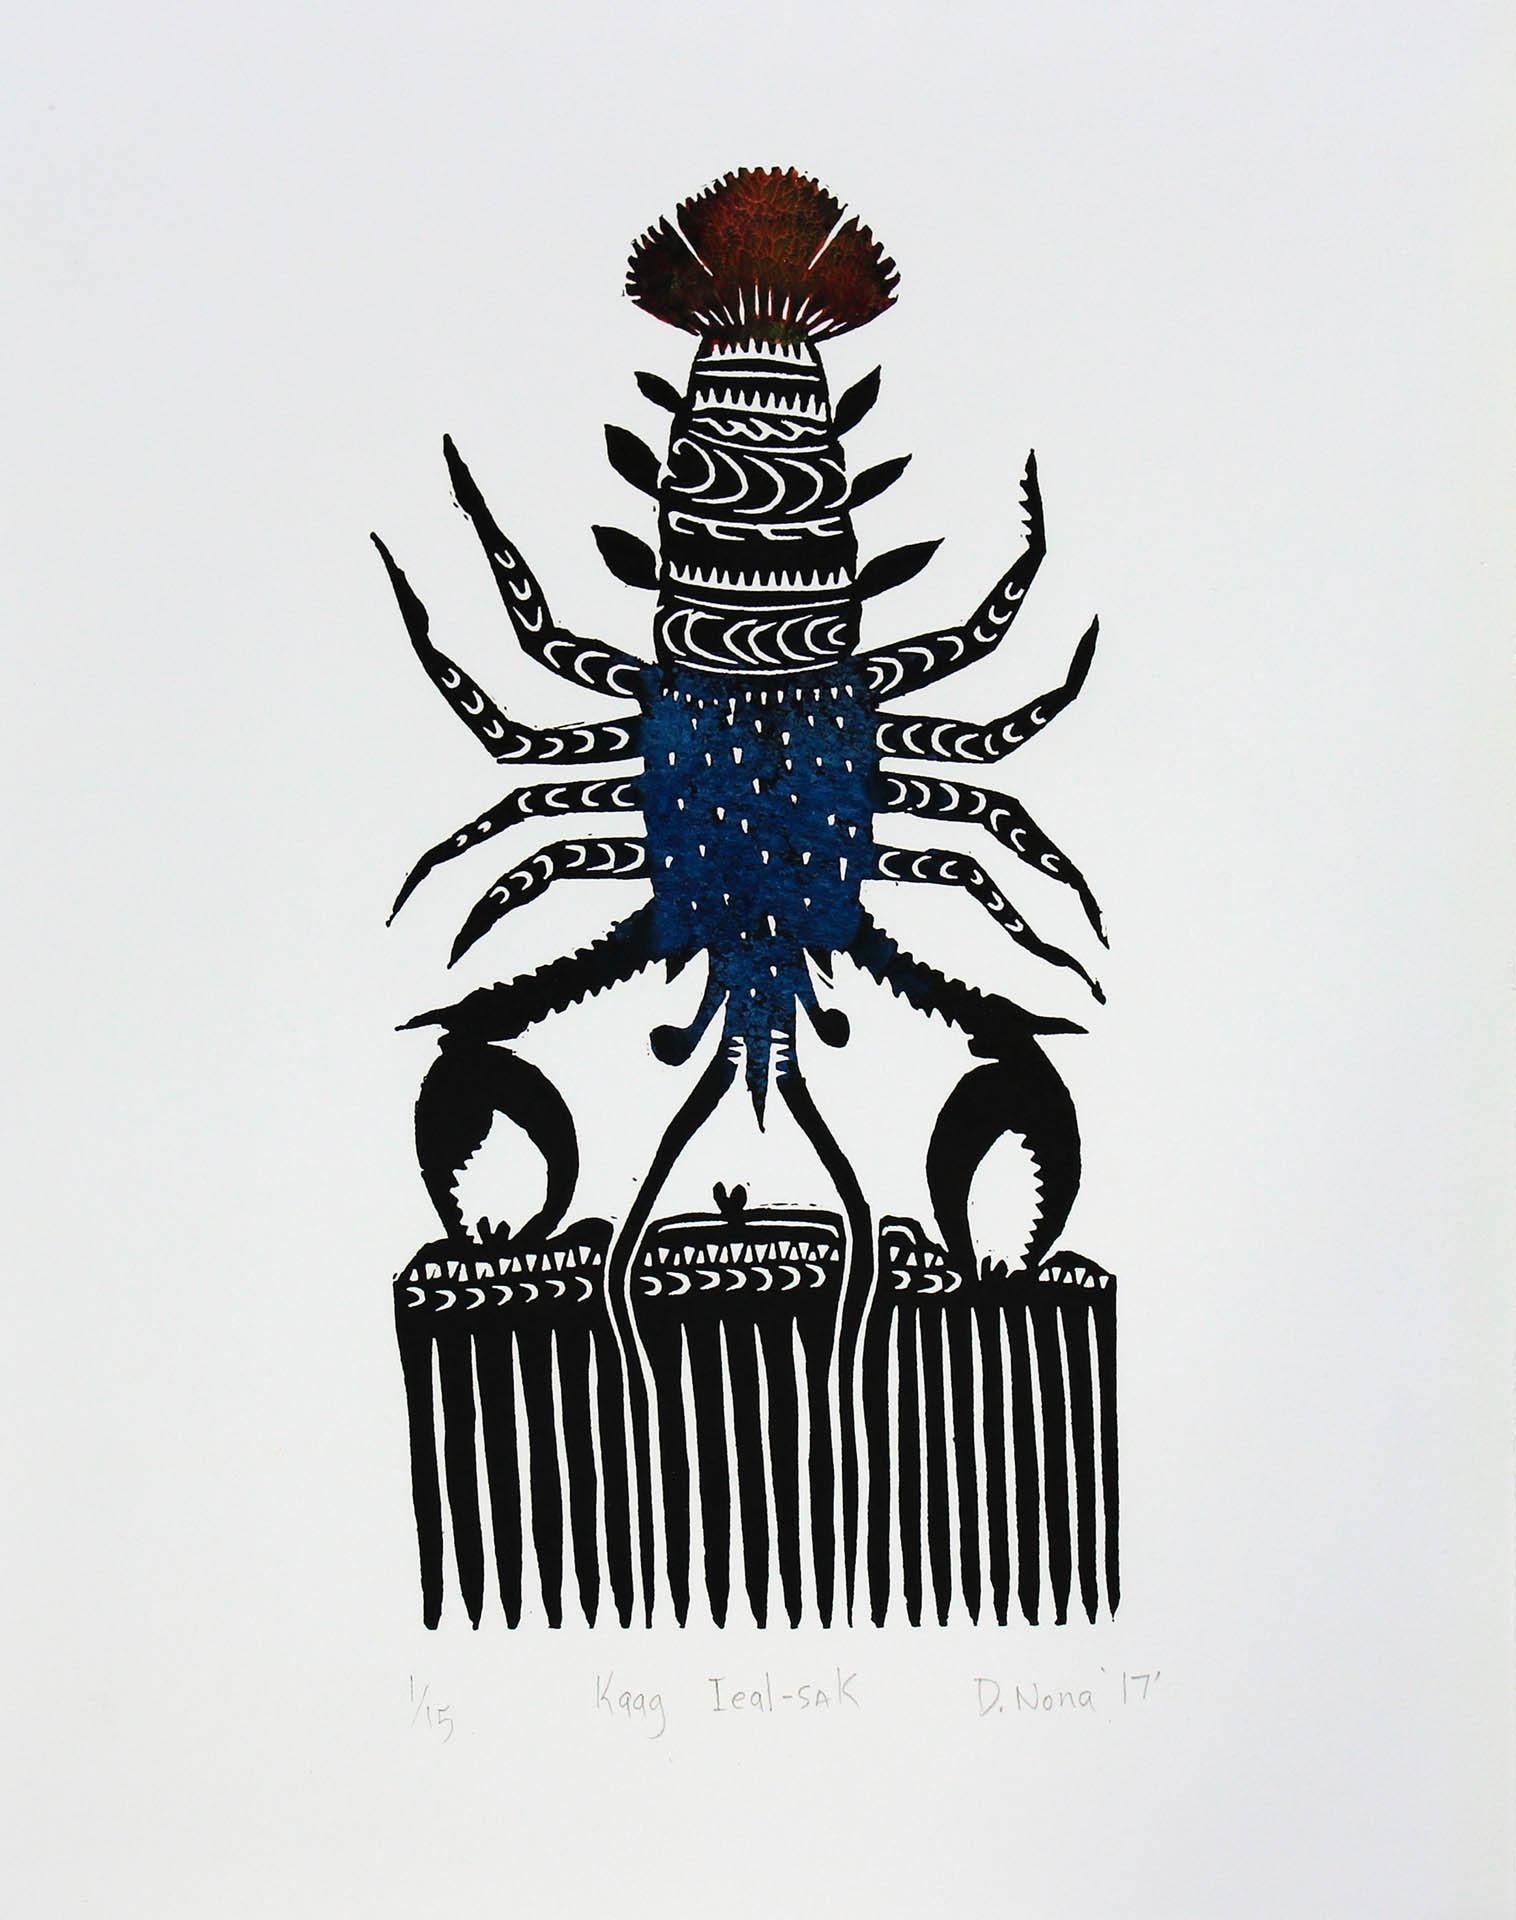 Kag ial -sak by Dennis Nona